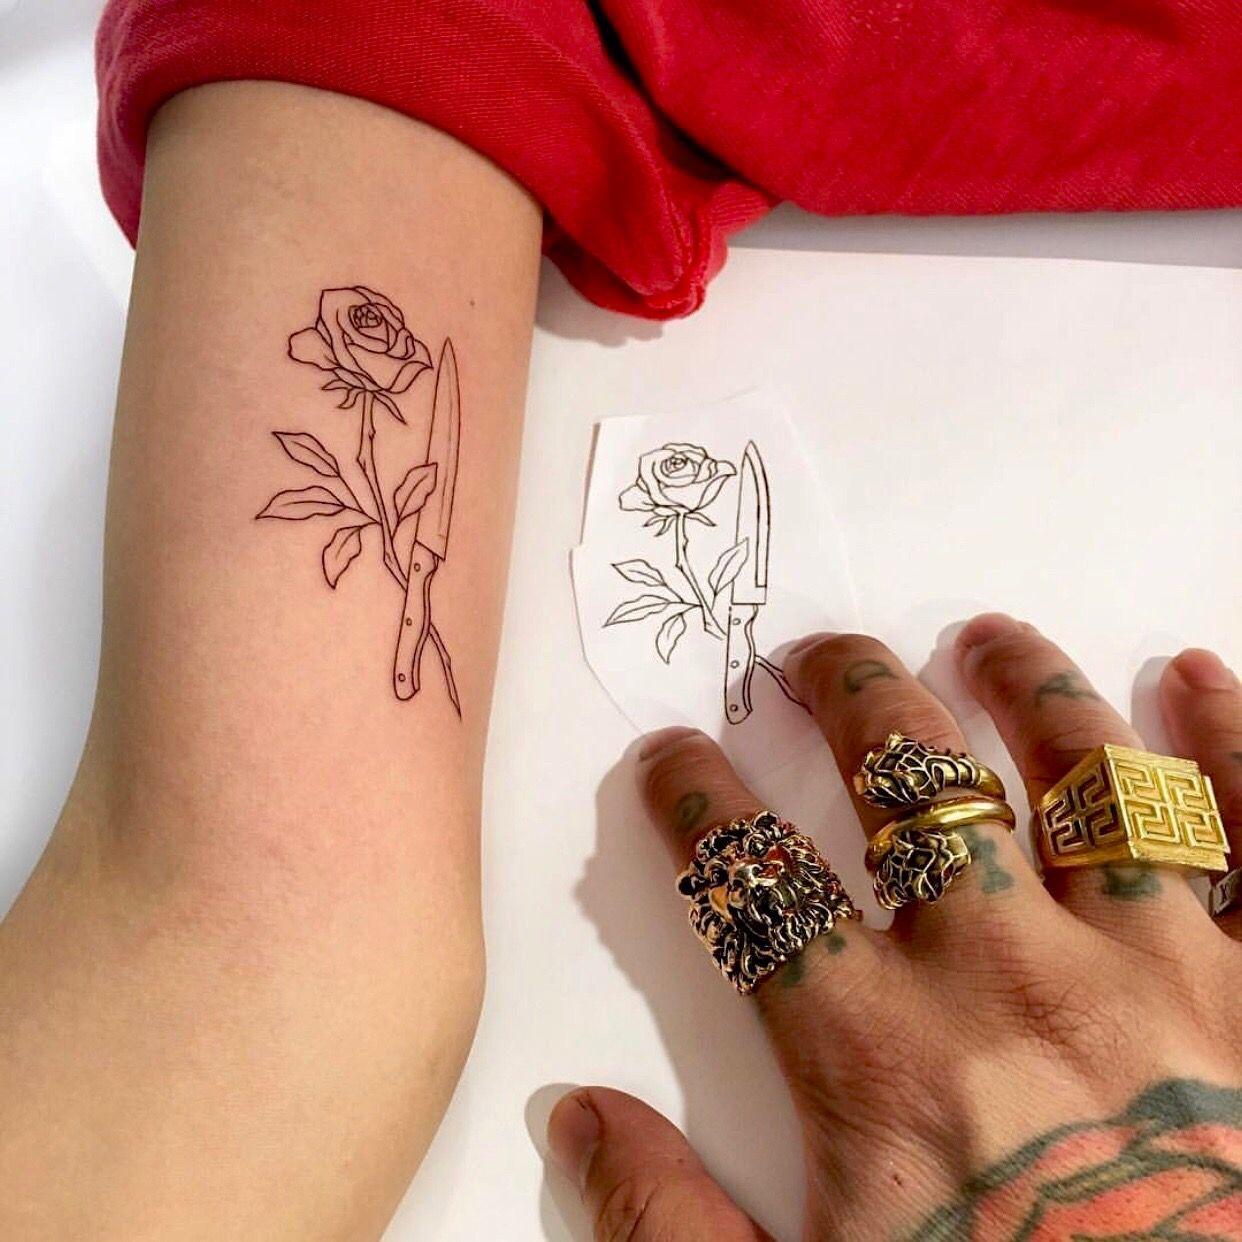 Pin by Whitney EdwardsLowe on Tattoos Tattoos for women